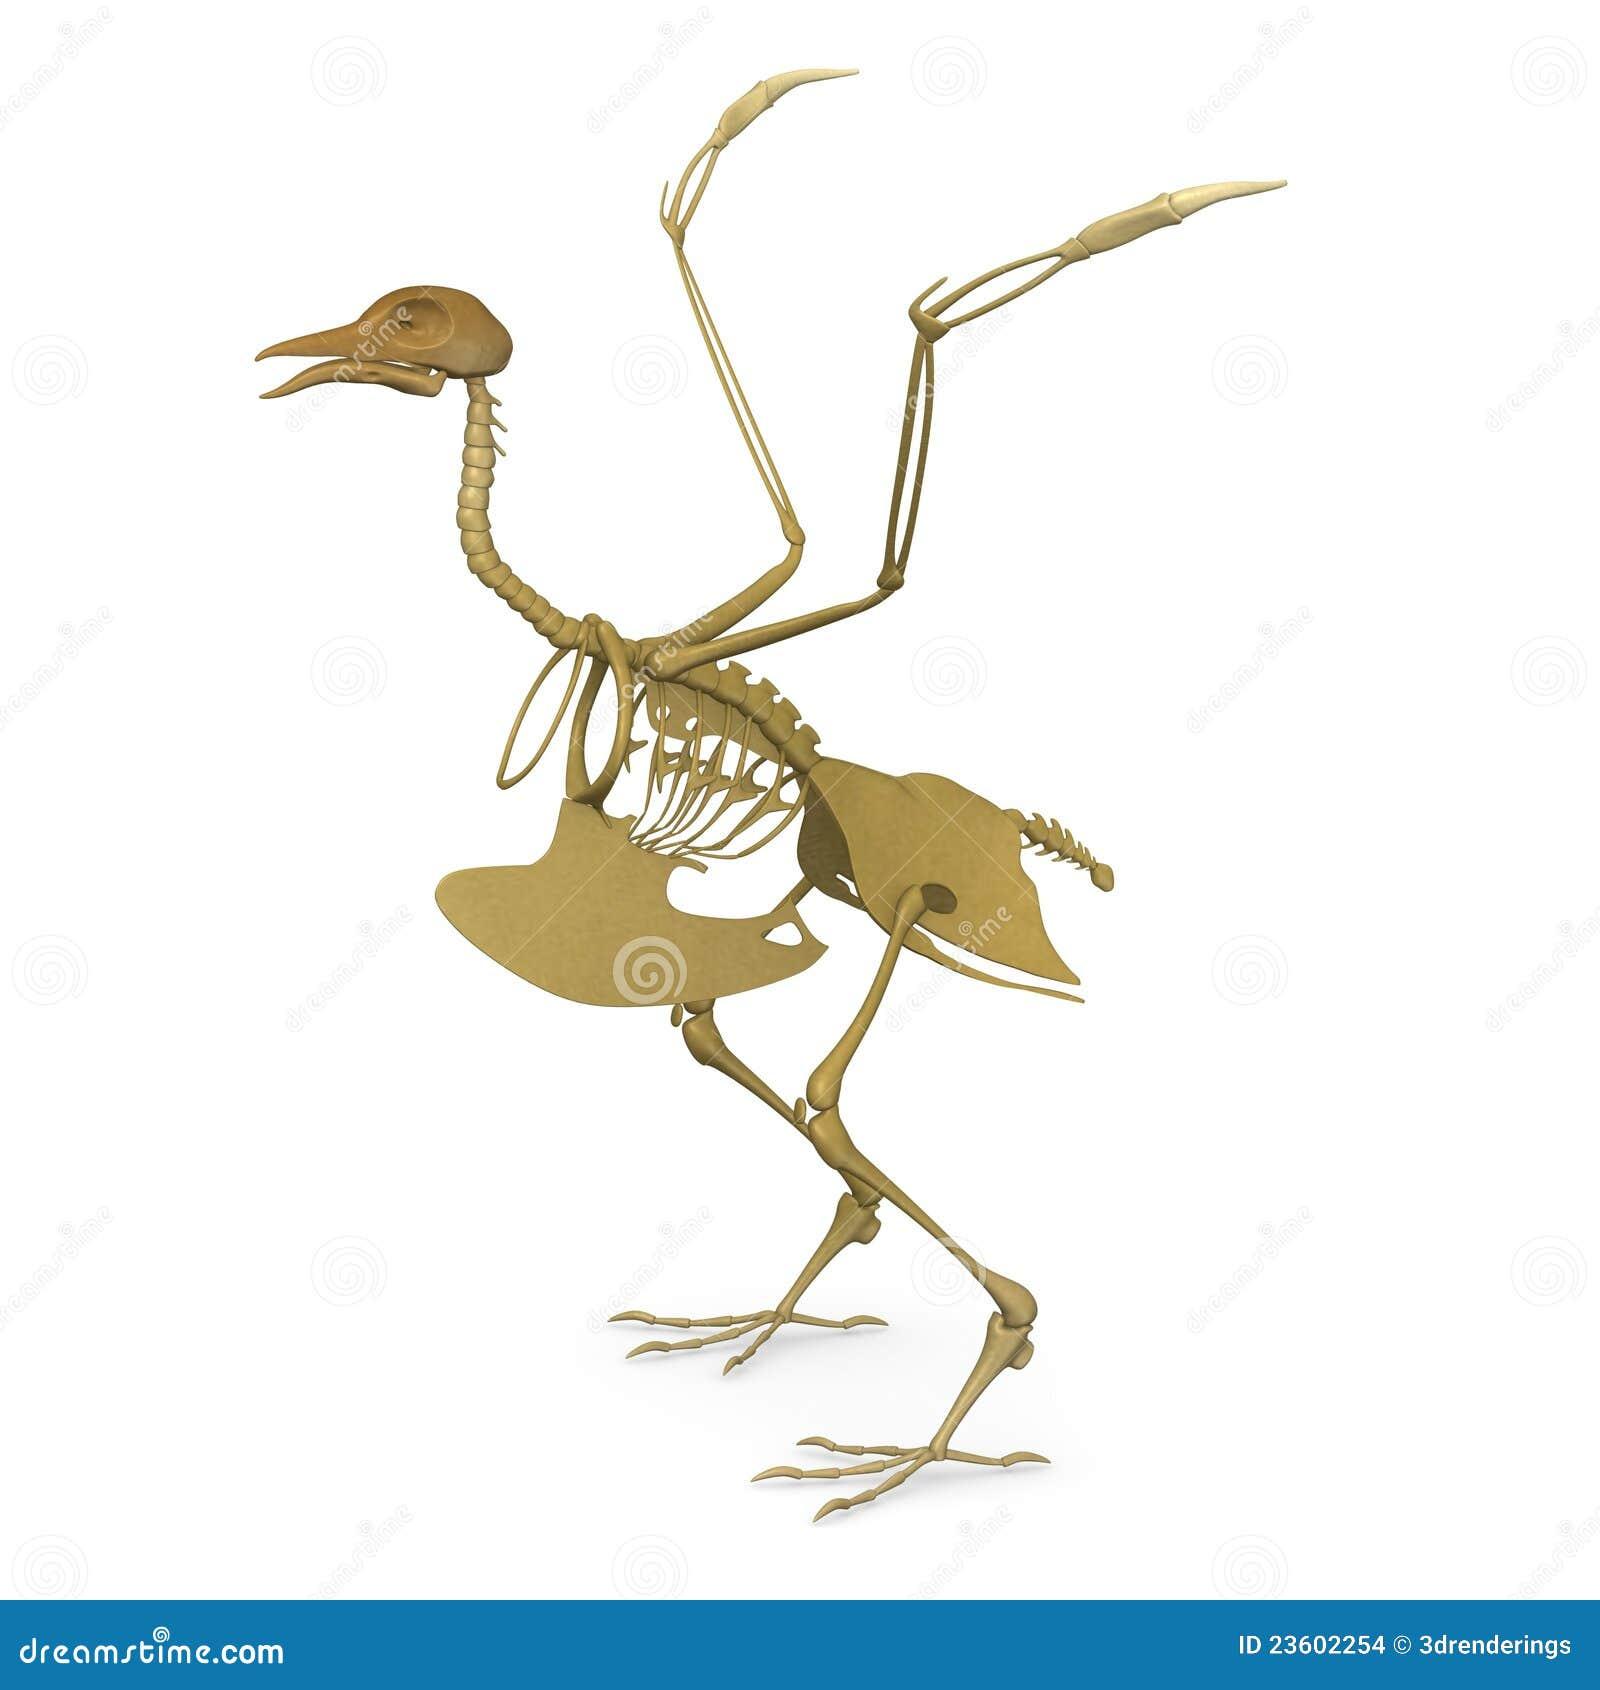 Bird skeleton stock illustration. Illustration of anatomy - 23602254